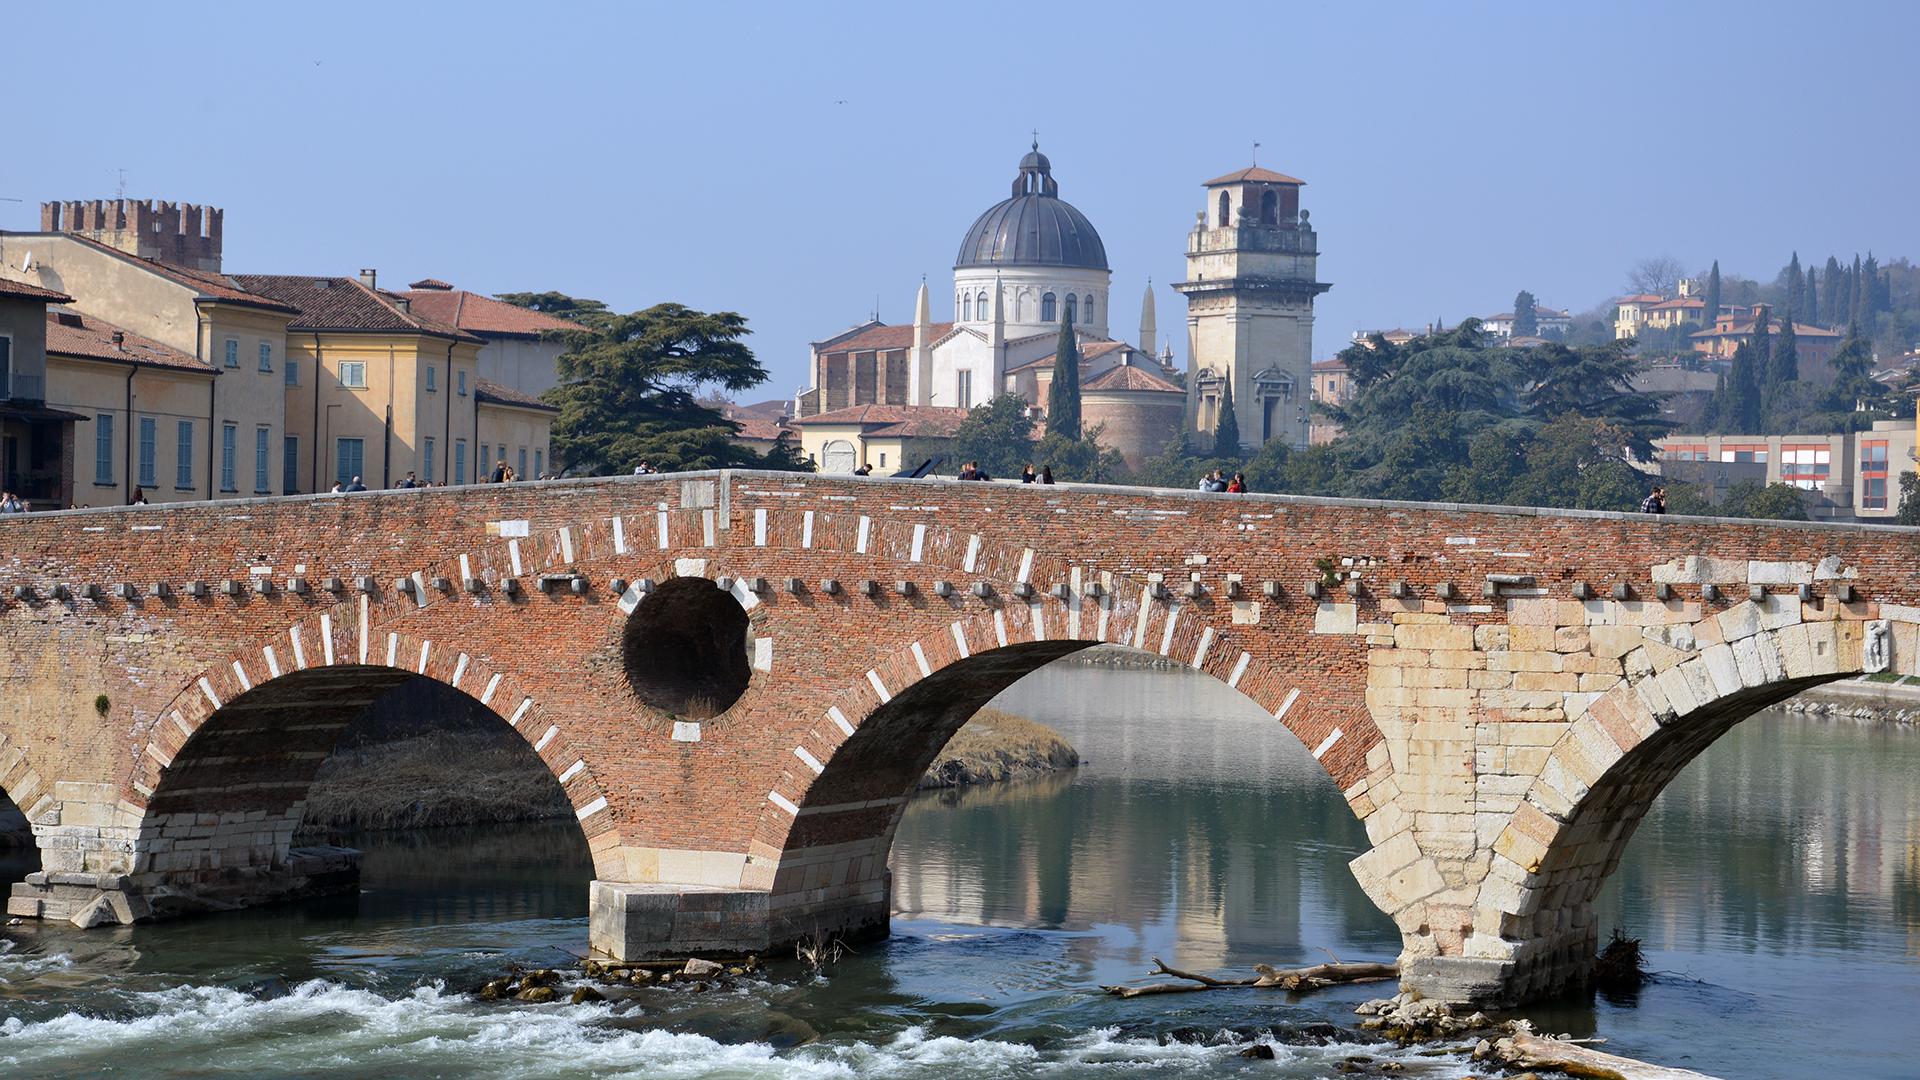 Una settimana a Verona